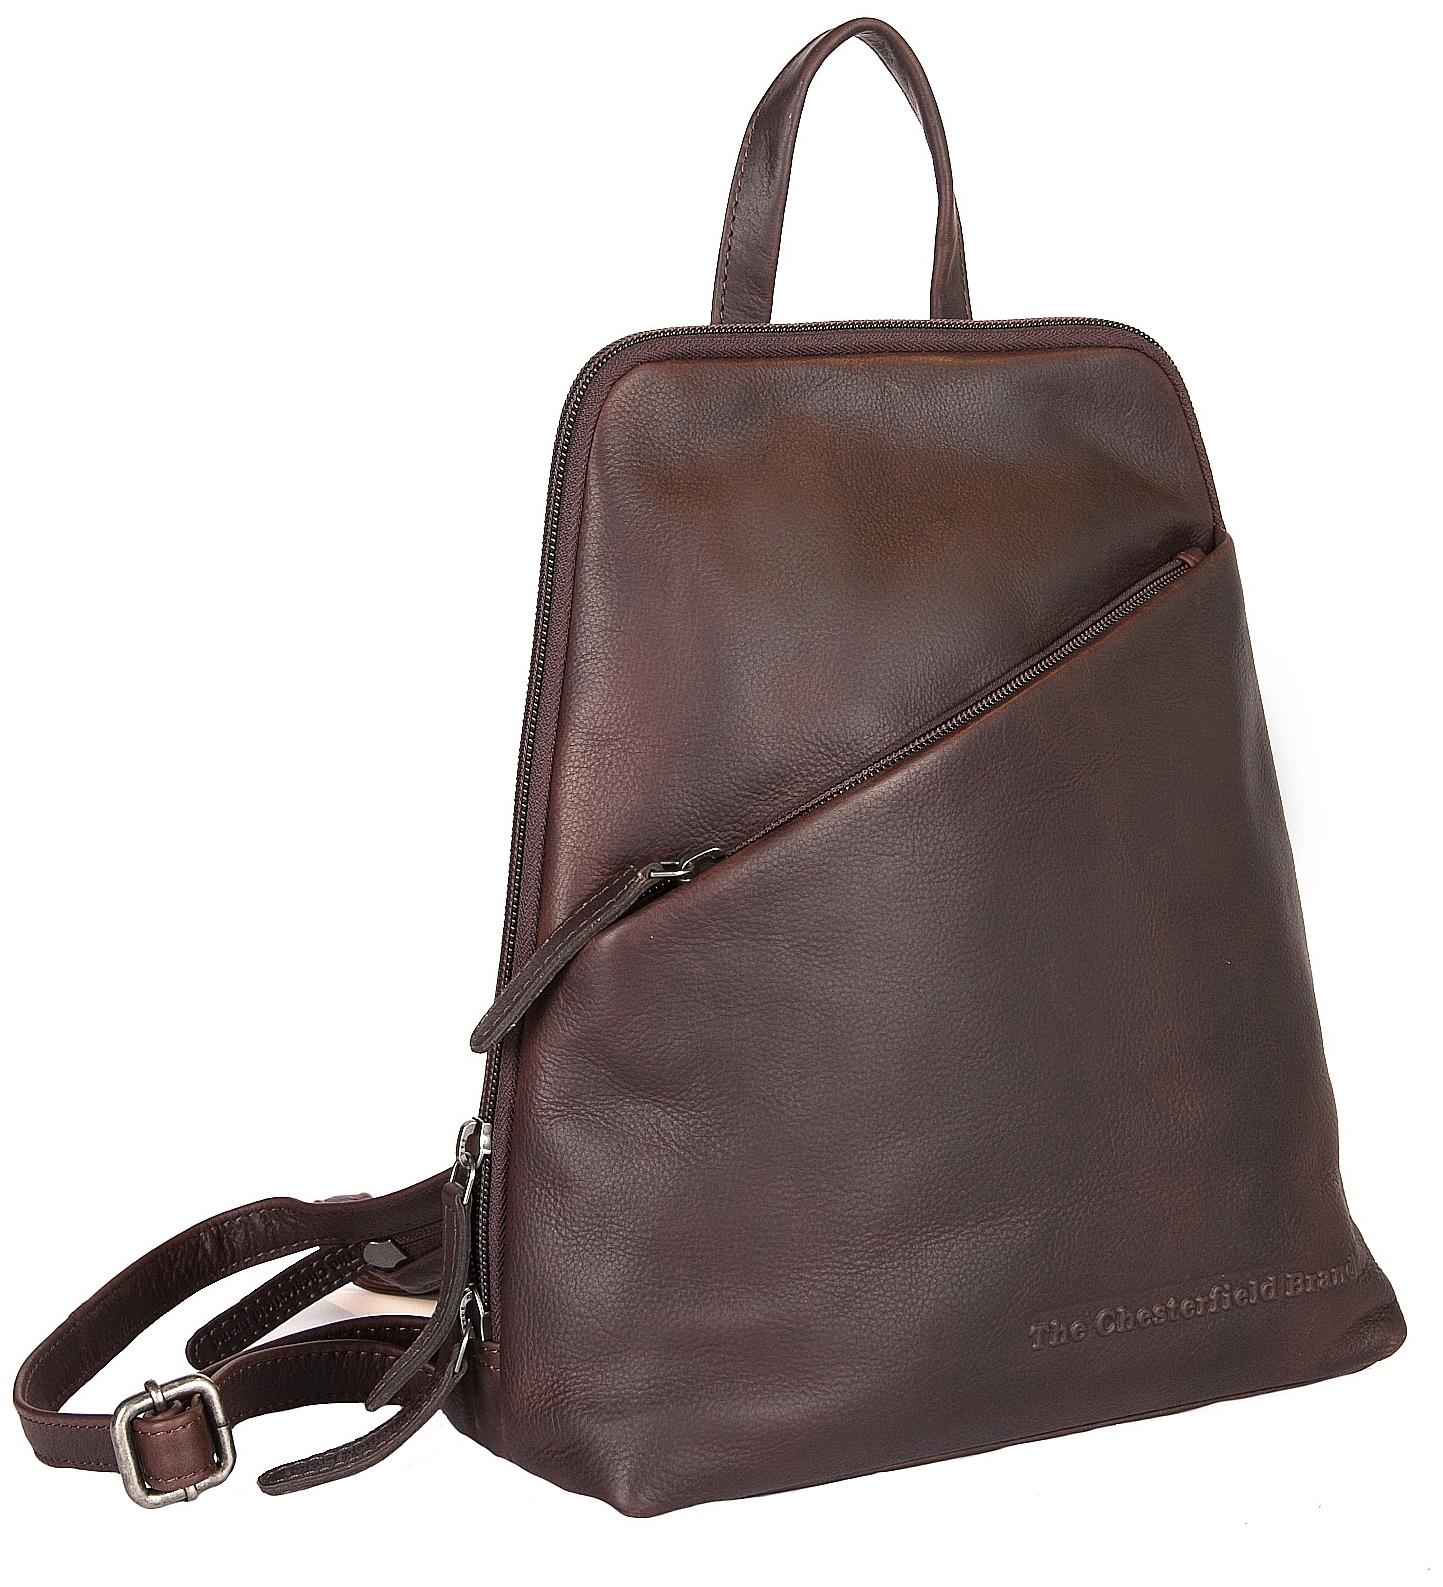 274f76b201c The Chesterfield Brand Dámský kožený batoh do města Claire C58.023501 hnědý